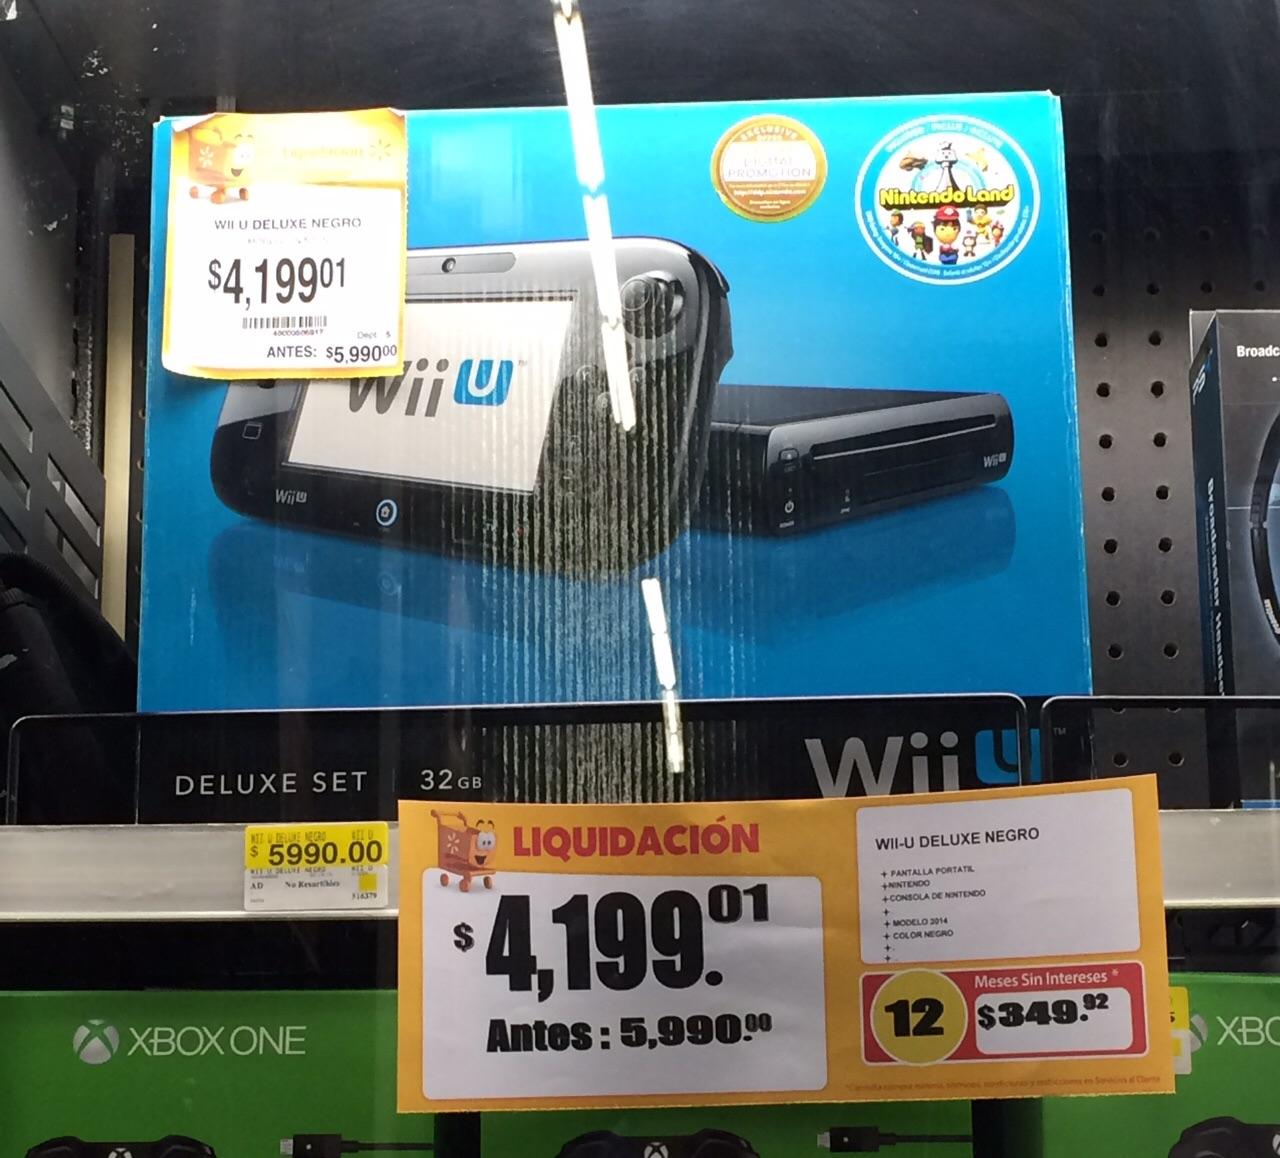 Walmart: Wii U Delux Negro a $4,199.01